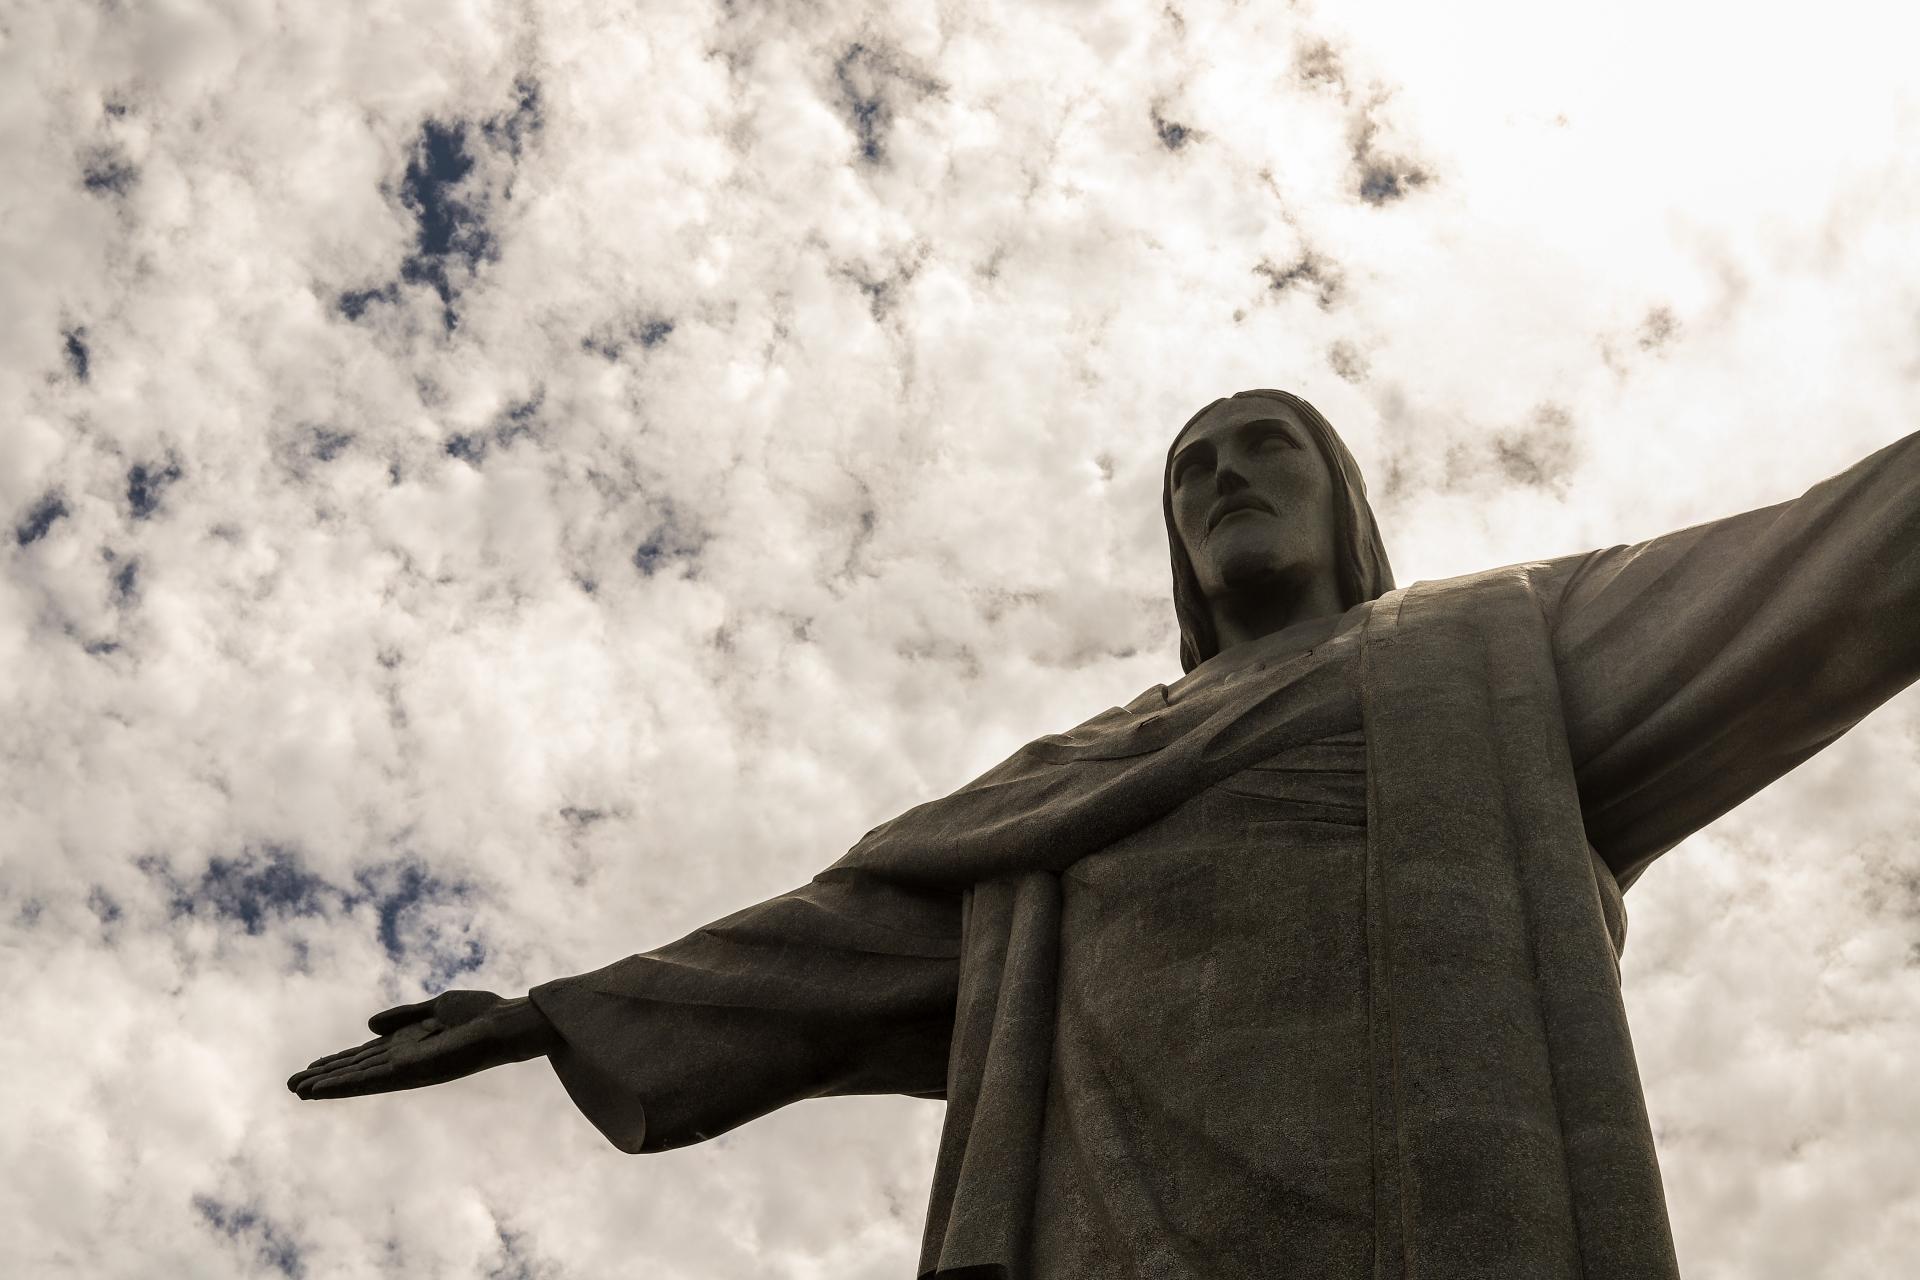 Aos pés do Cristo Redentor, Dom Orani reza pelos países atingidos por coronavírus